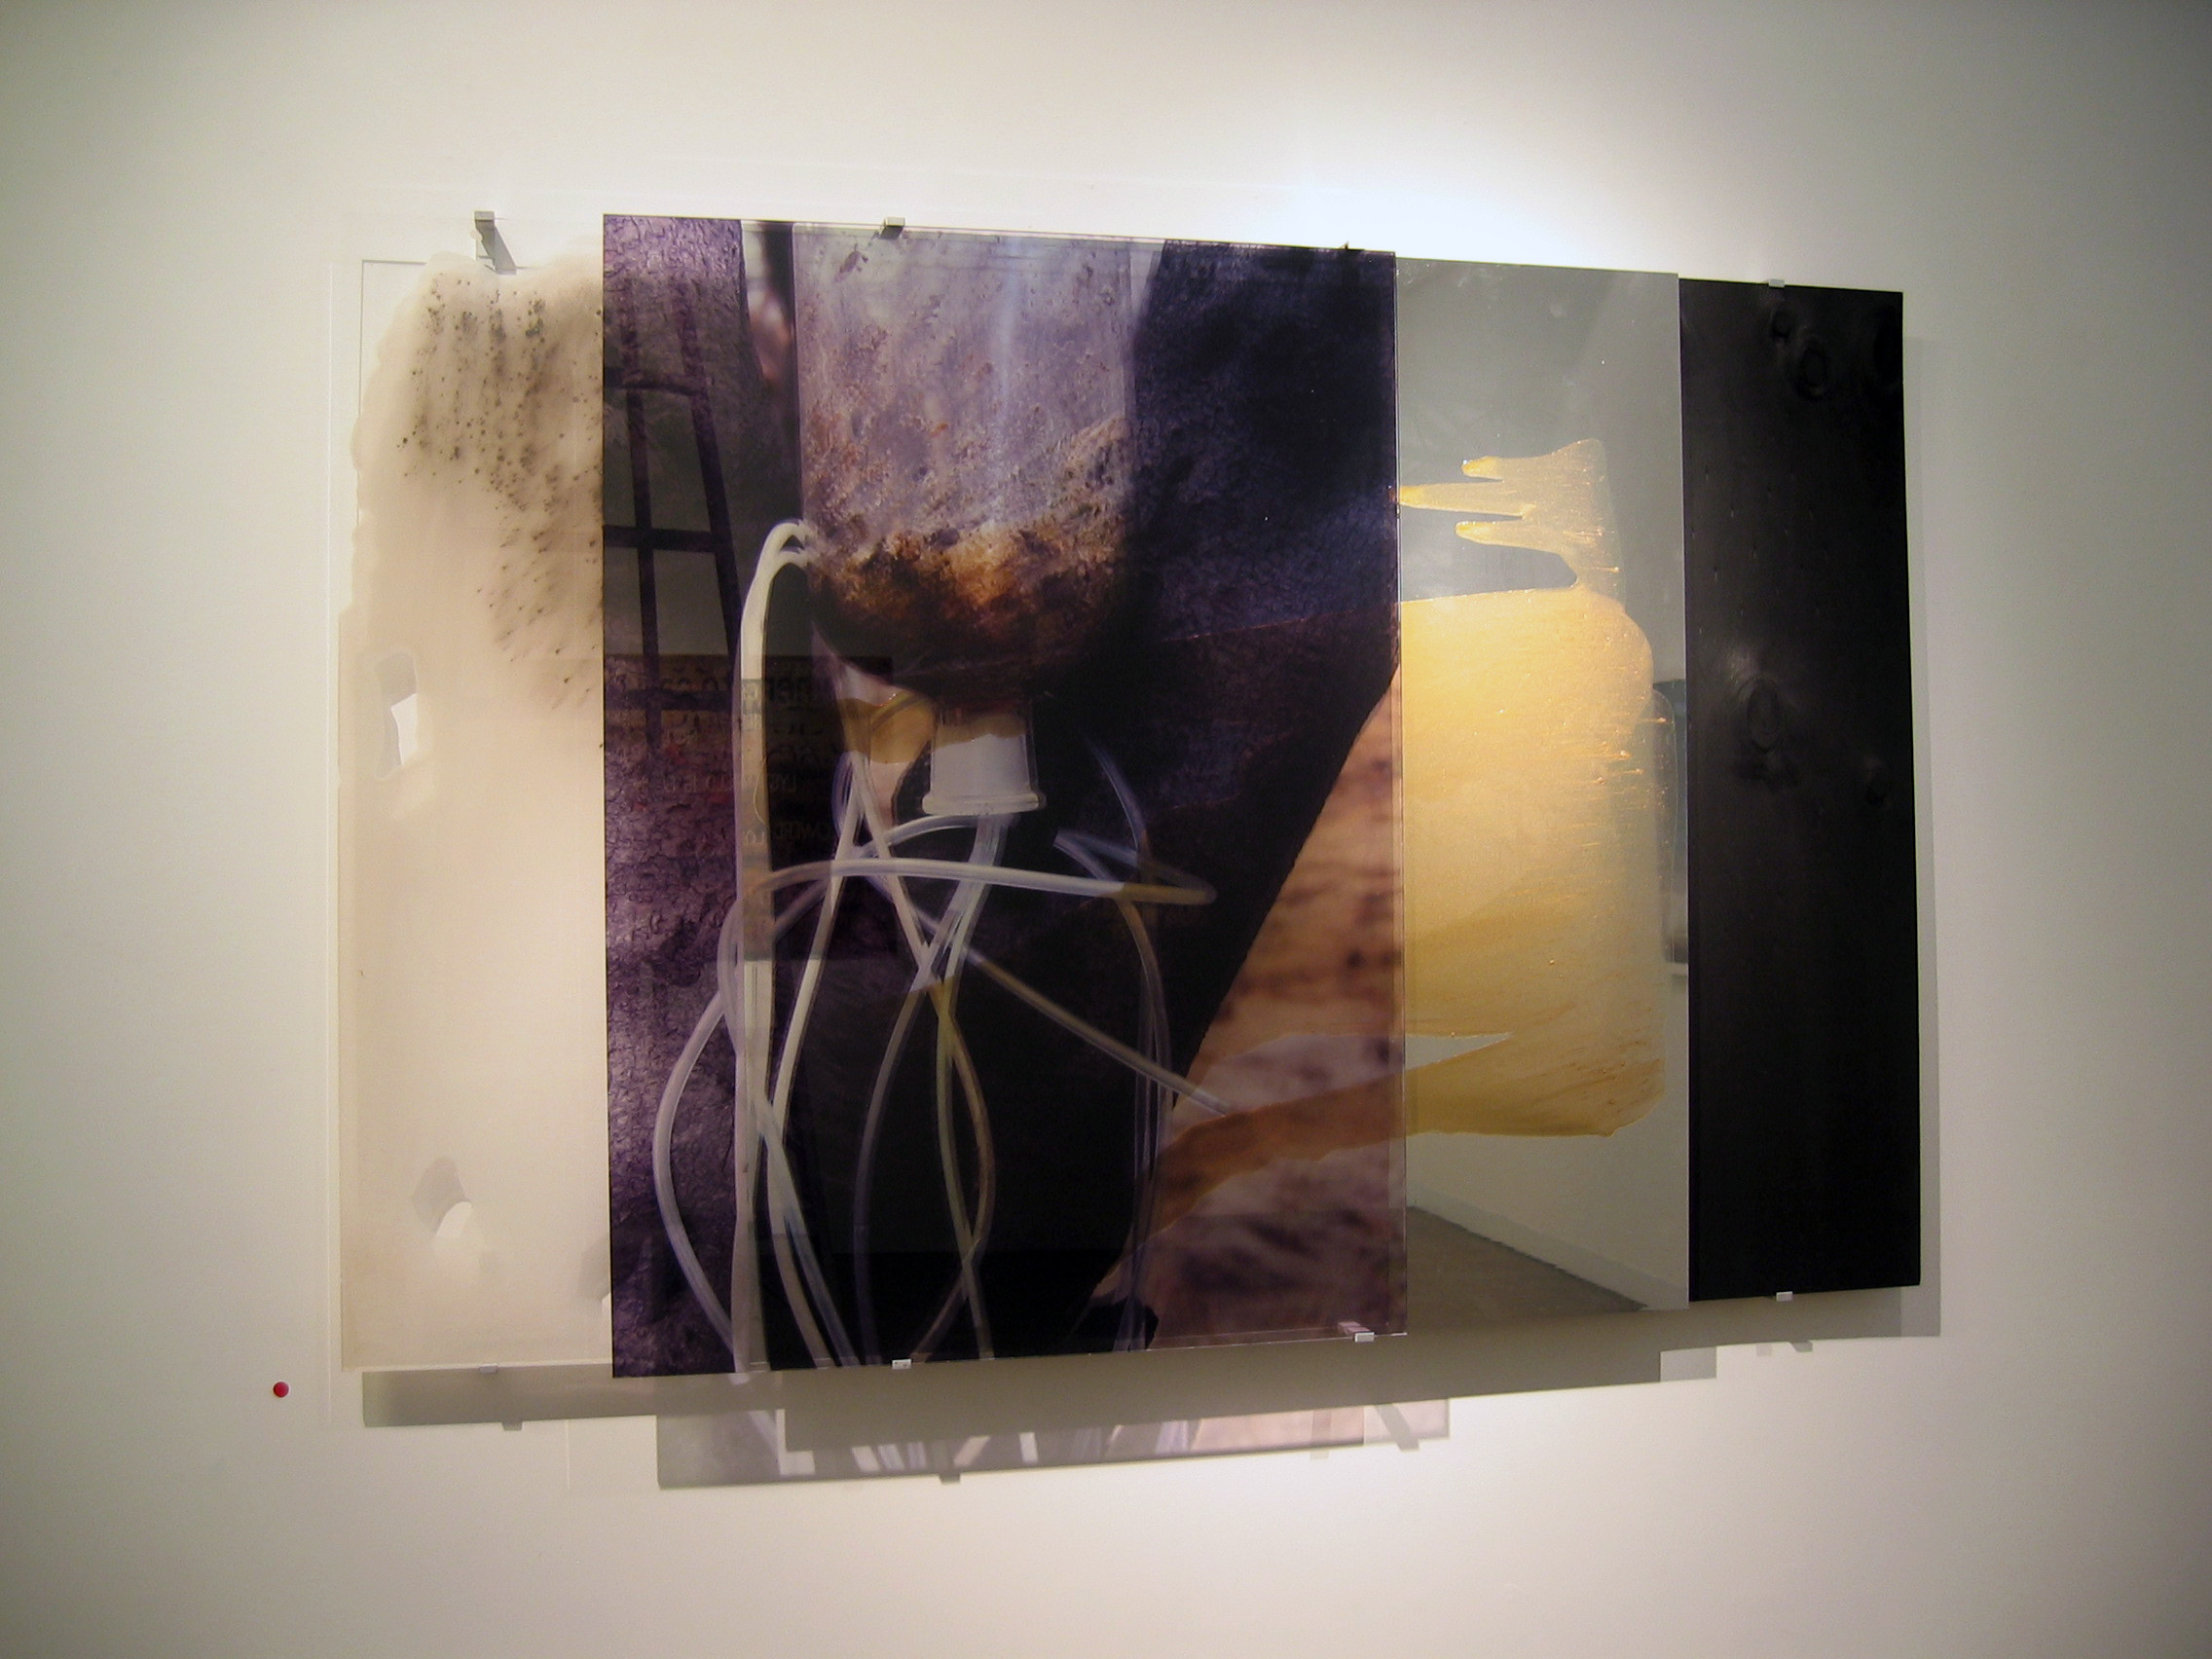 JANET LAURENCE    Carbon Heart II  2006 Duraclear on Shinkolite Acrylic 155 x 100 cm